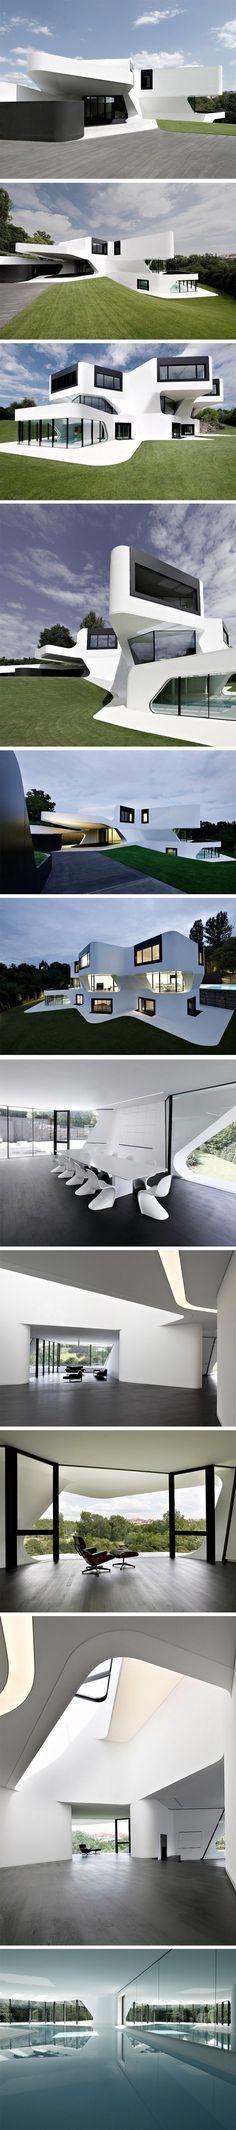 Dupli Casa par J.Mayer H. - Journal du Design